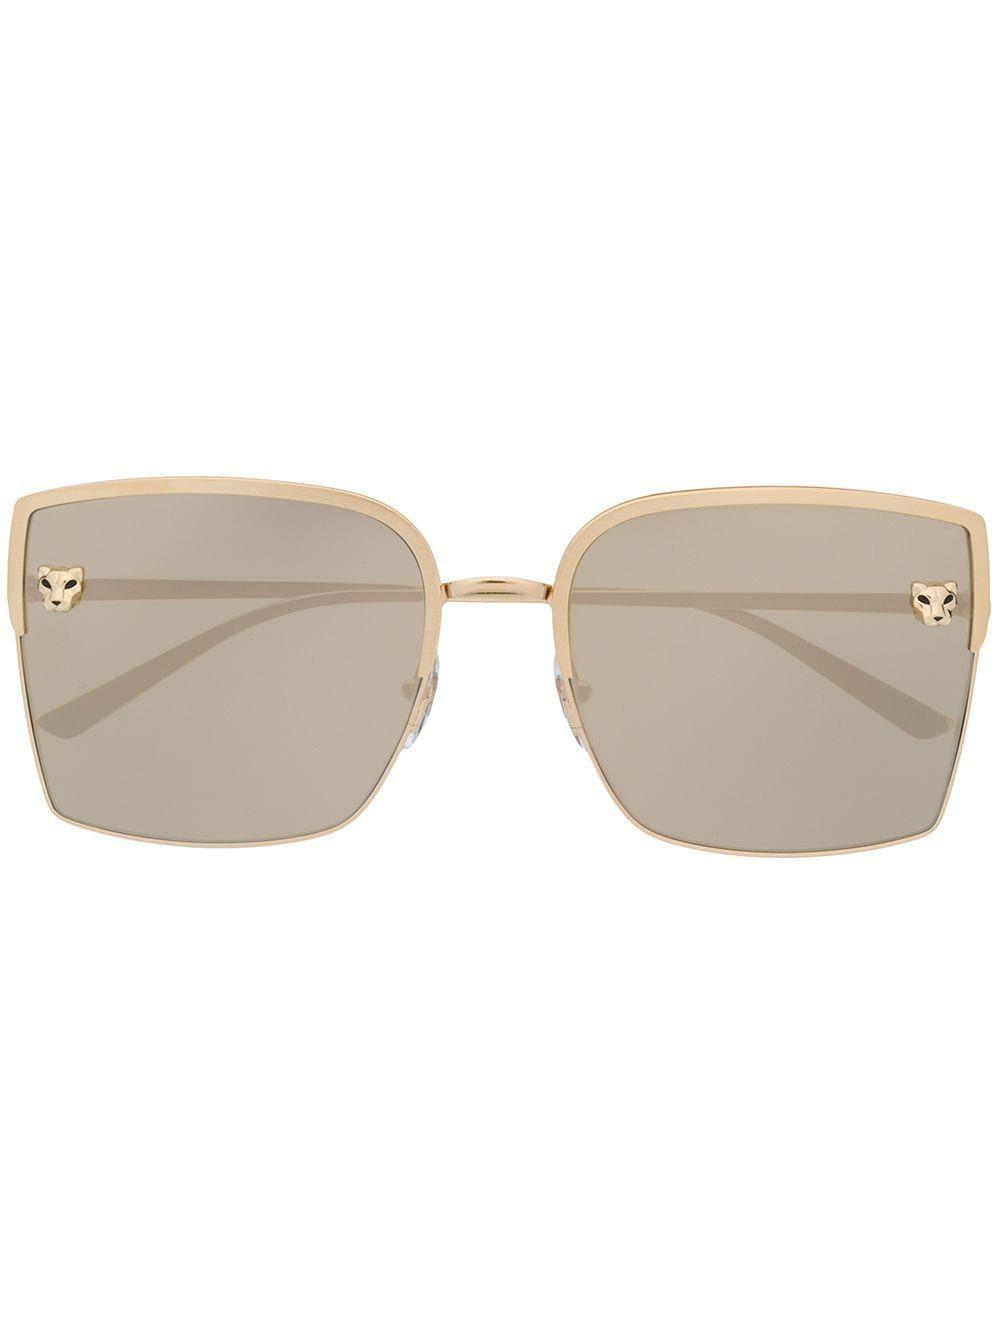 Cartier Panthère oversized frame sunglasses